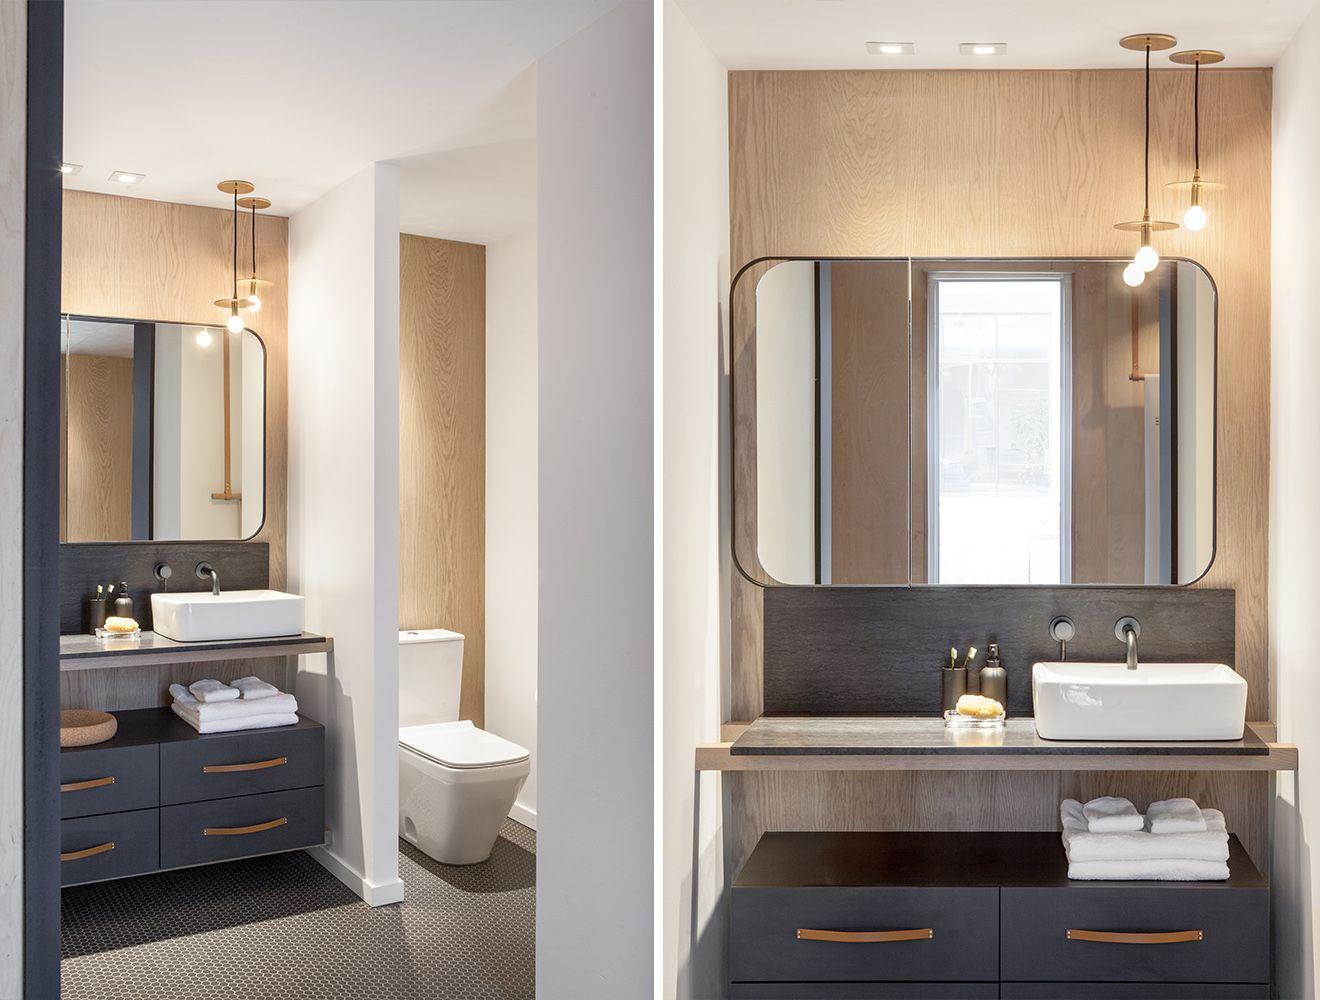 Mason studio cabin residence washroom design bathroom and bath room - Washroom designs ...